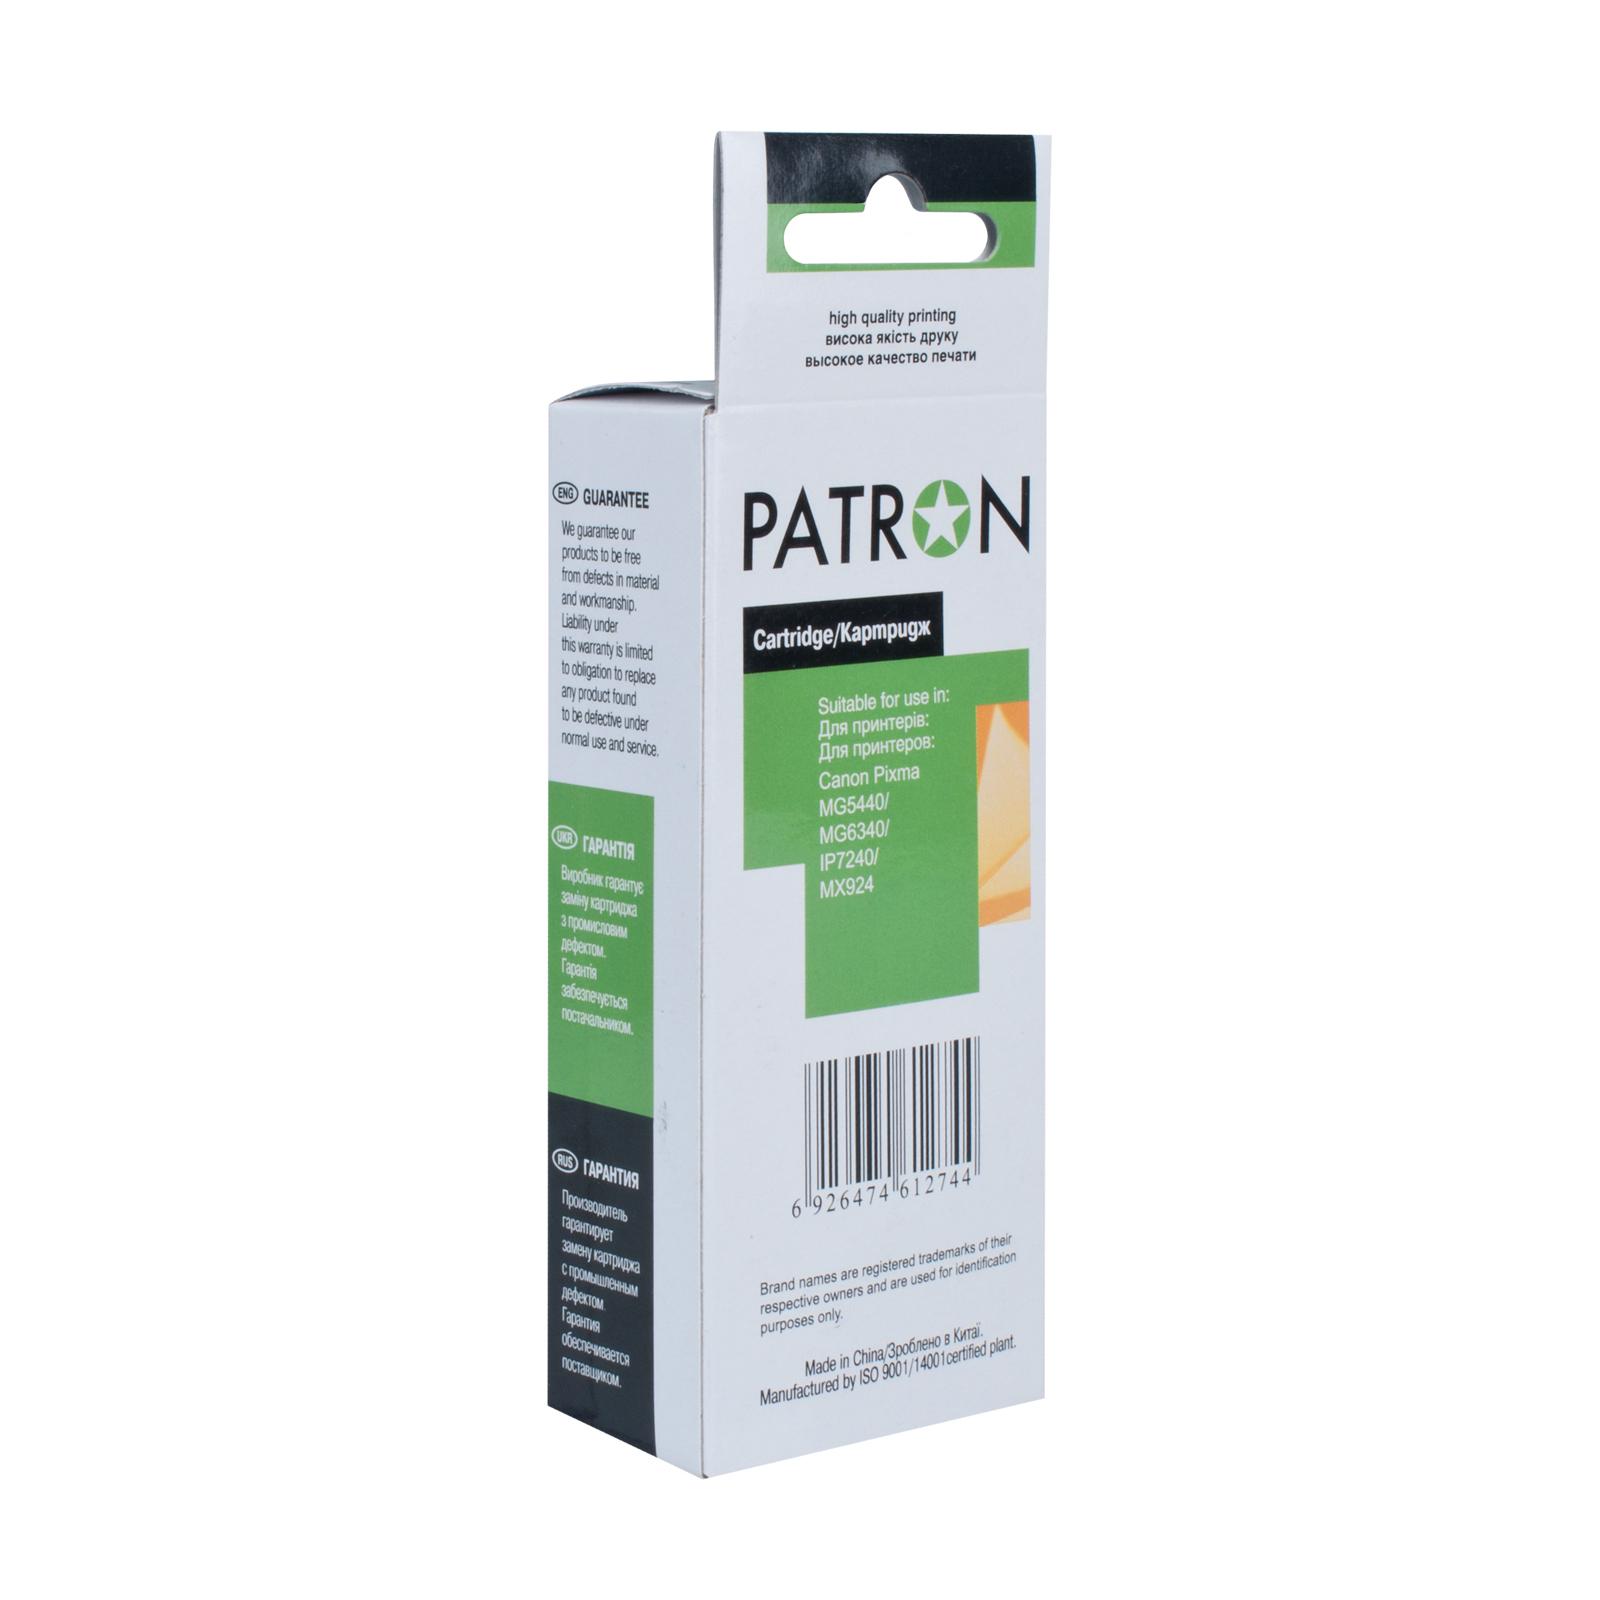 Картридж PATRON CANON CLI-451XLBk (PN-451XLBK) BLACK (CI-CAN-CLI-451-B-PN) изображение 4